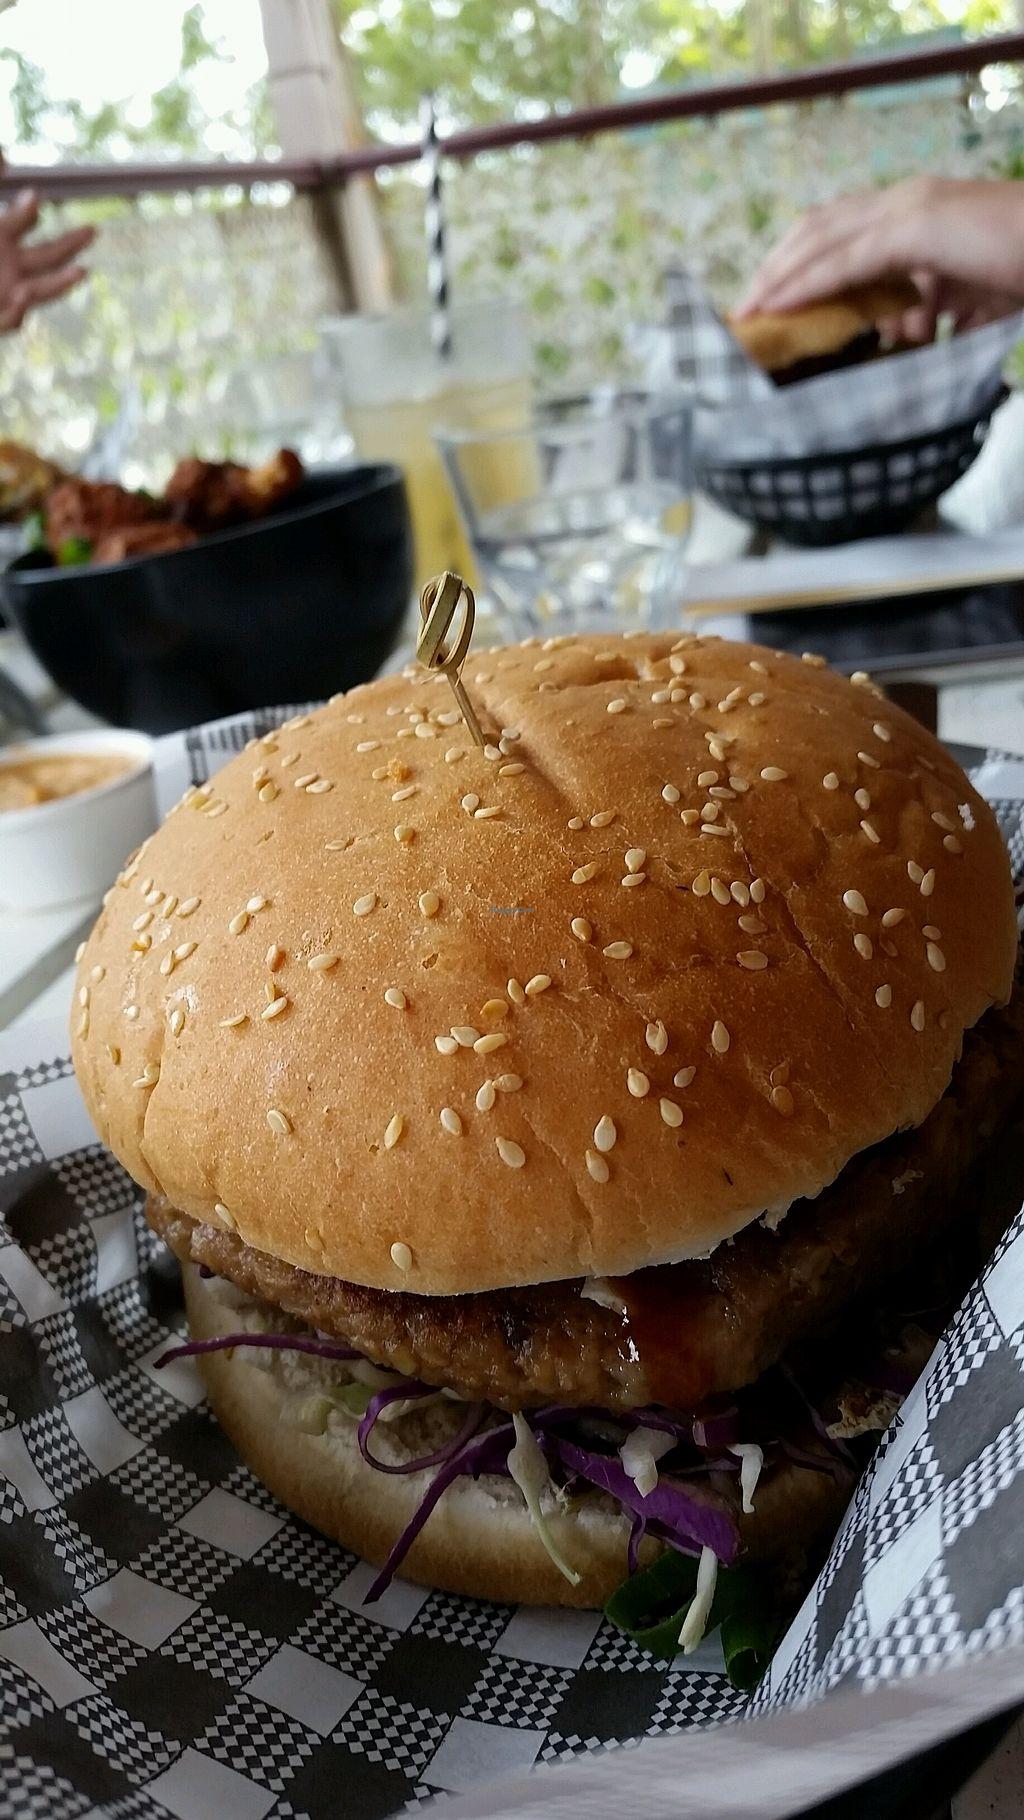 "Photo of Bonta Vera  by <a href=""/members/profile/emmawestrup"">emmawestrup</a> <br/>Walnut burger...mmmmm <br/> January 28, 2018  - <a href='/contact/abuse/image/69201/352050'>Report</a>"